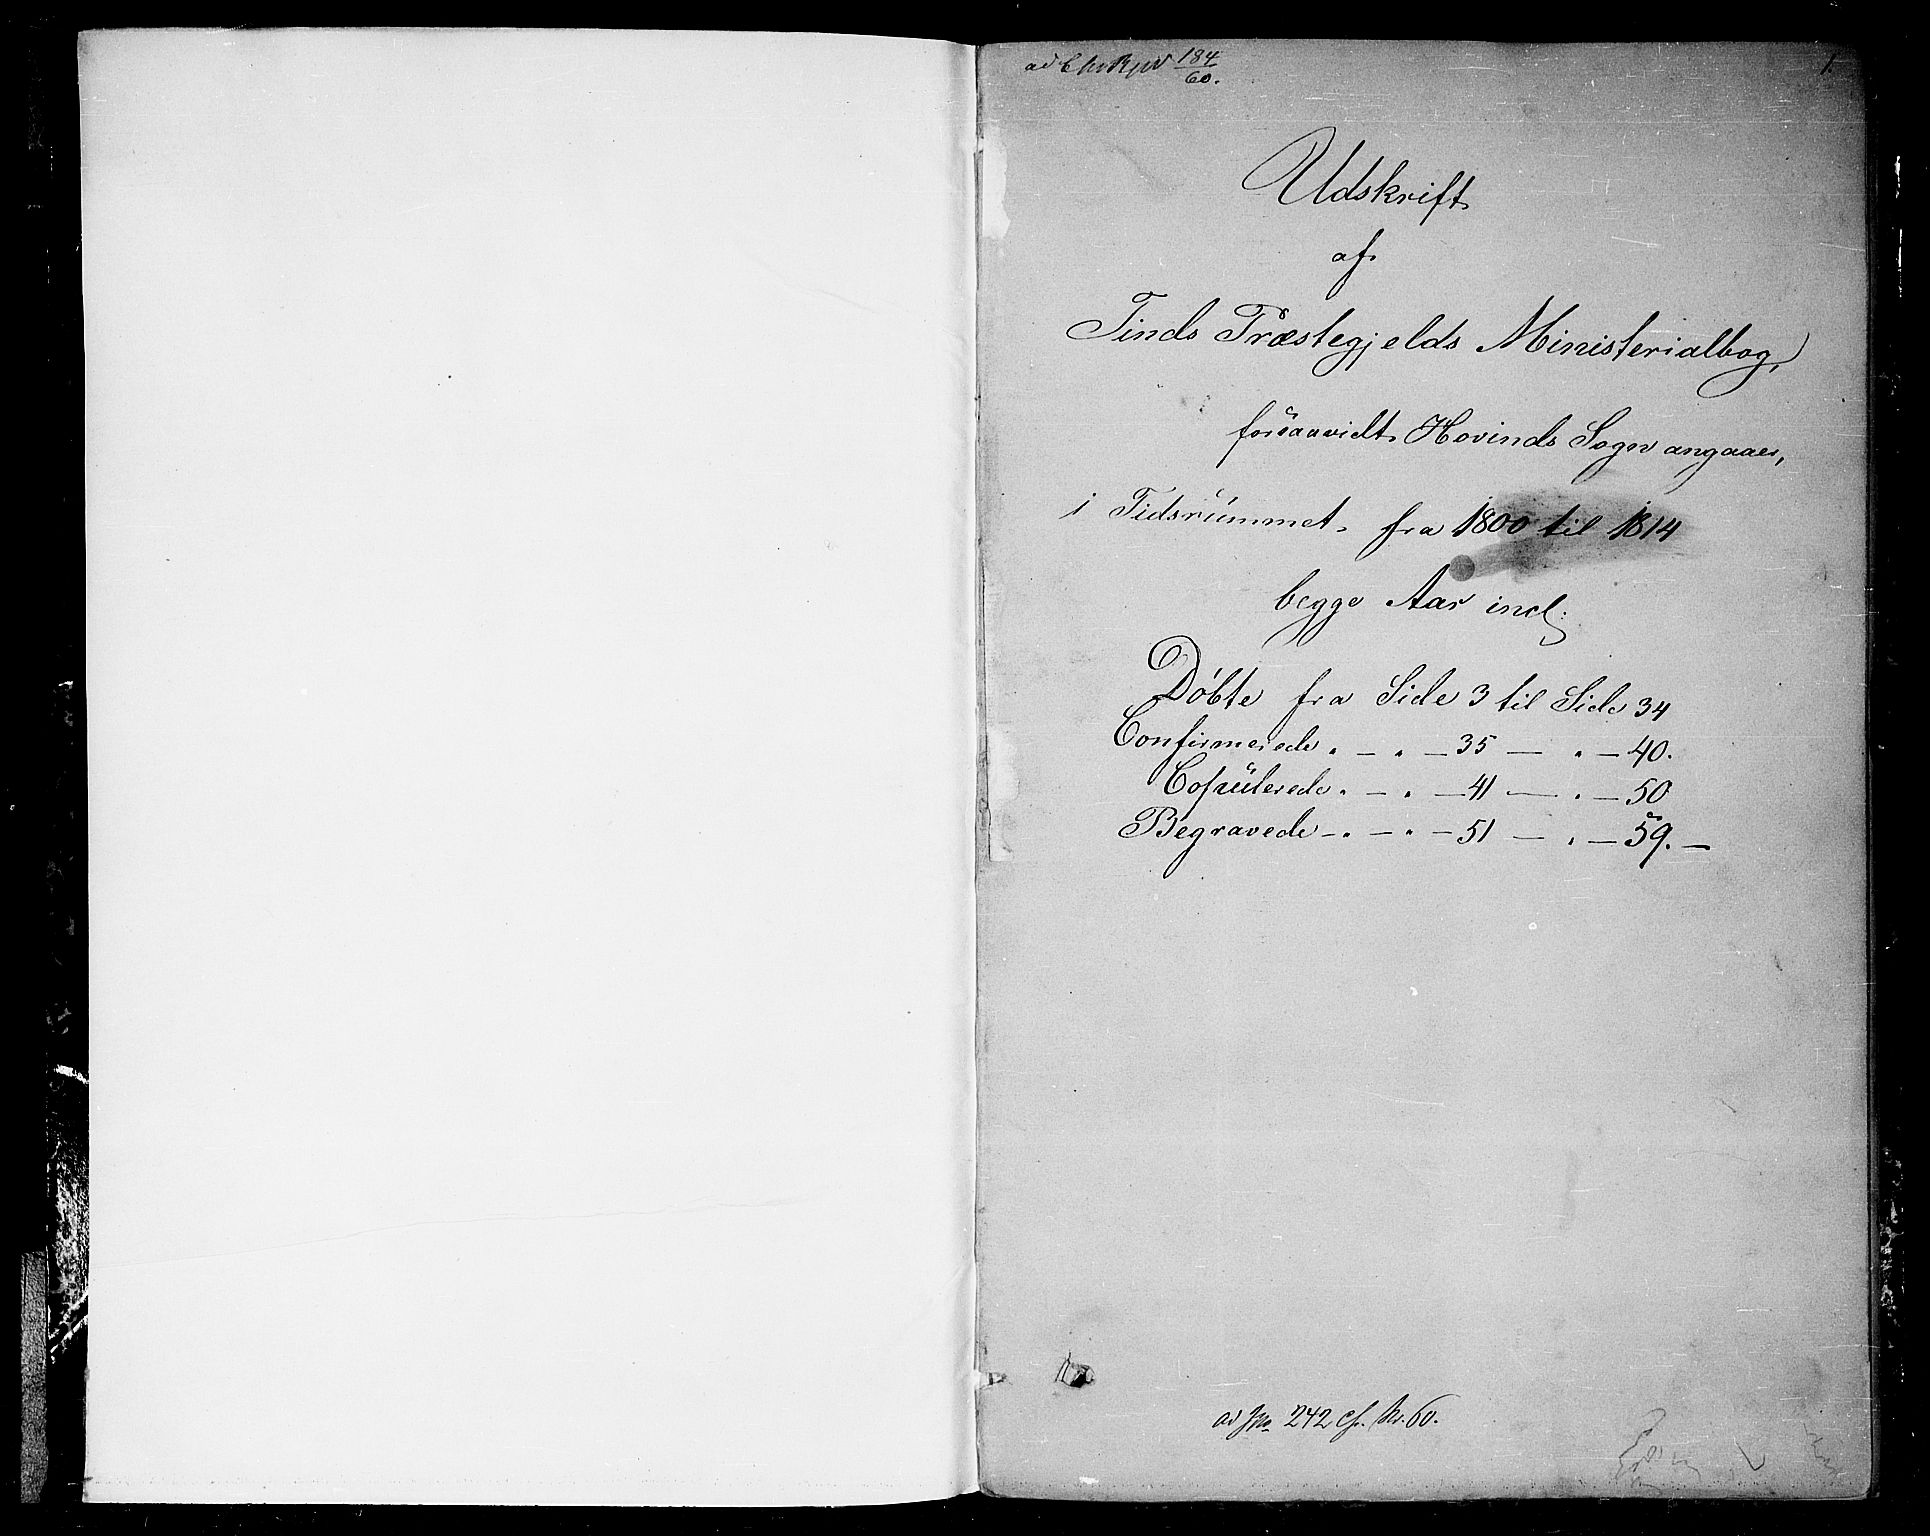 SAKO, Gransherad kirkebøker, F/Fb/L0001: Ministerialbok nr. II 1, 1800-1814, s. 0-1